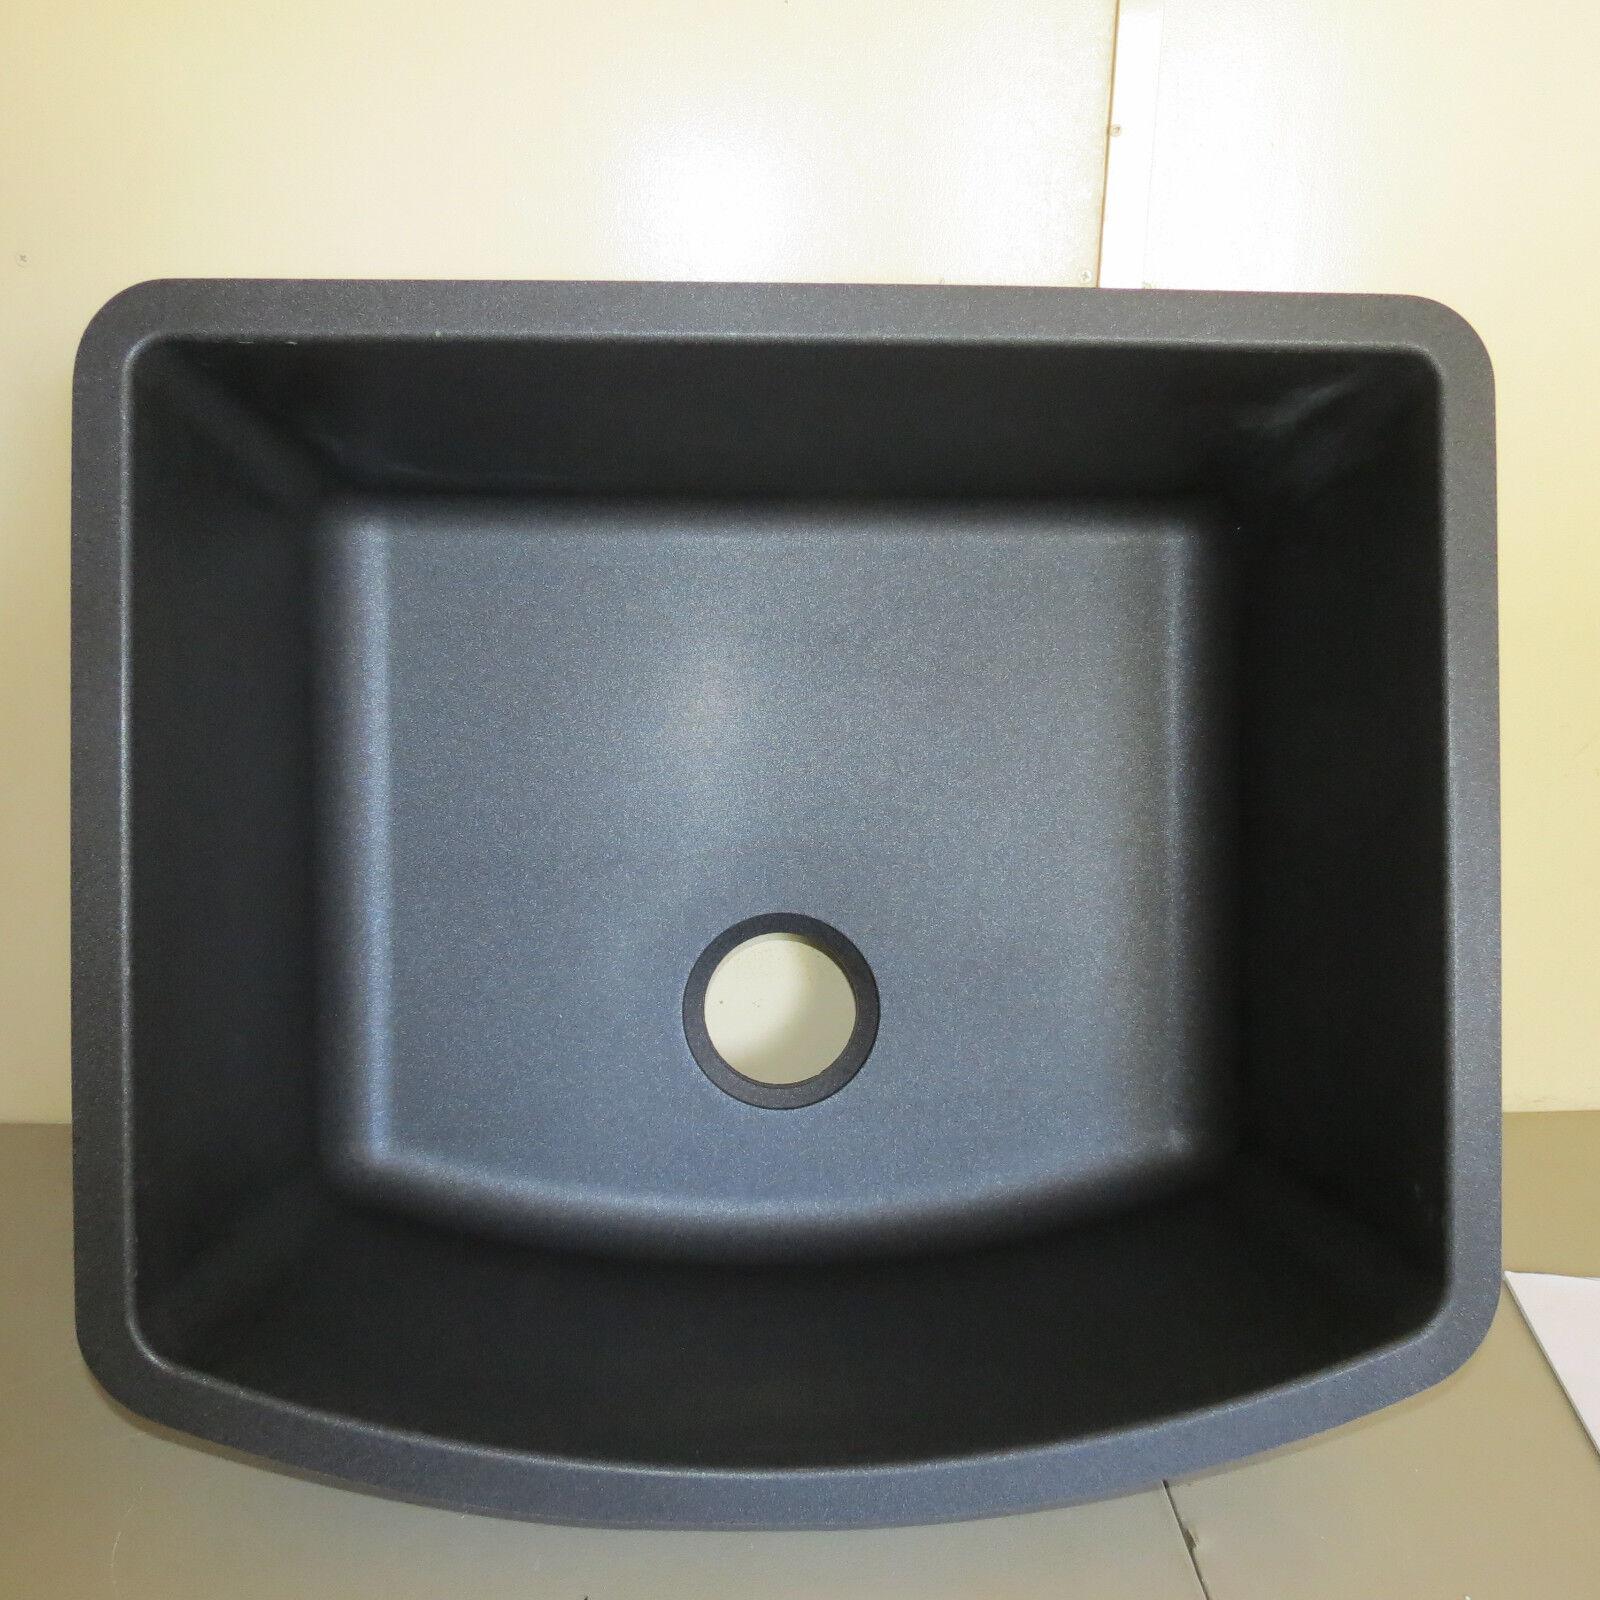 Blanco SILGRANIT Single Bowl Sink Undermount 440174 - Anthracite ...